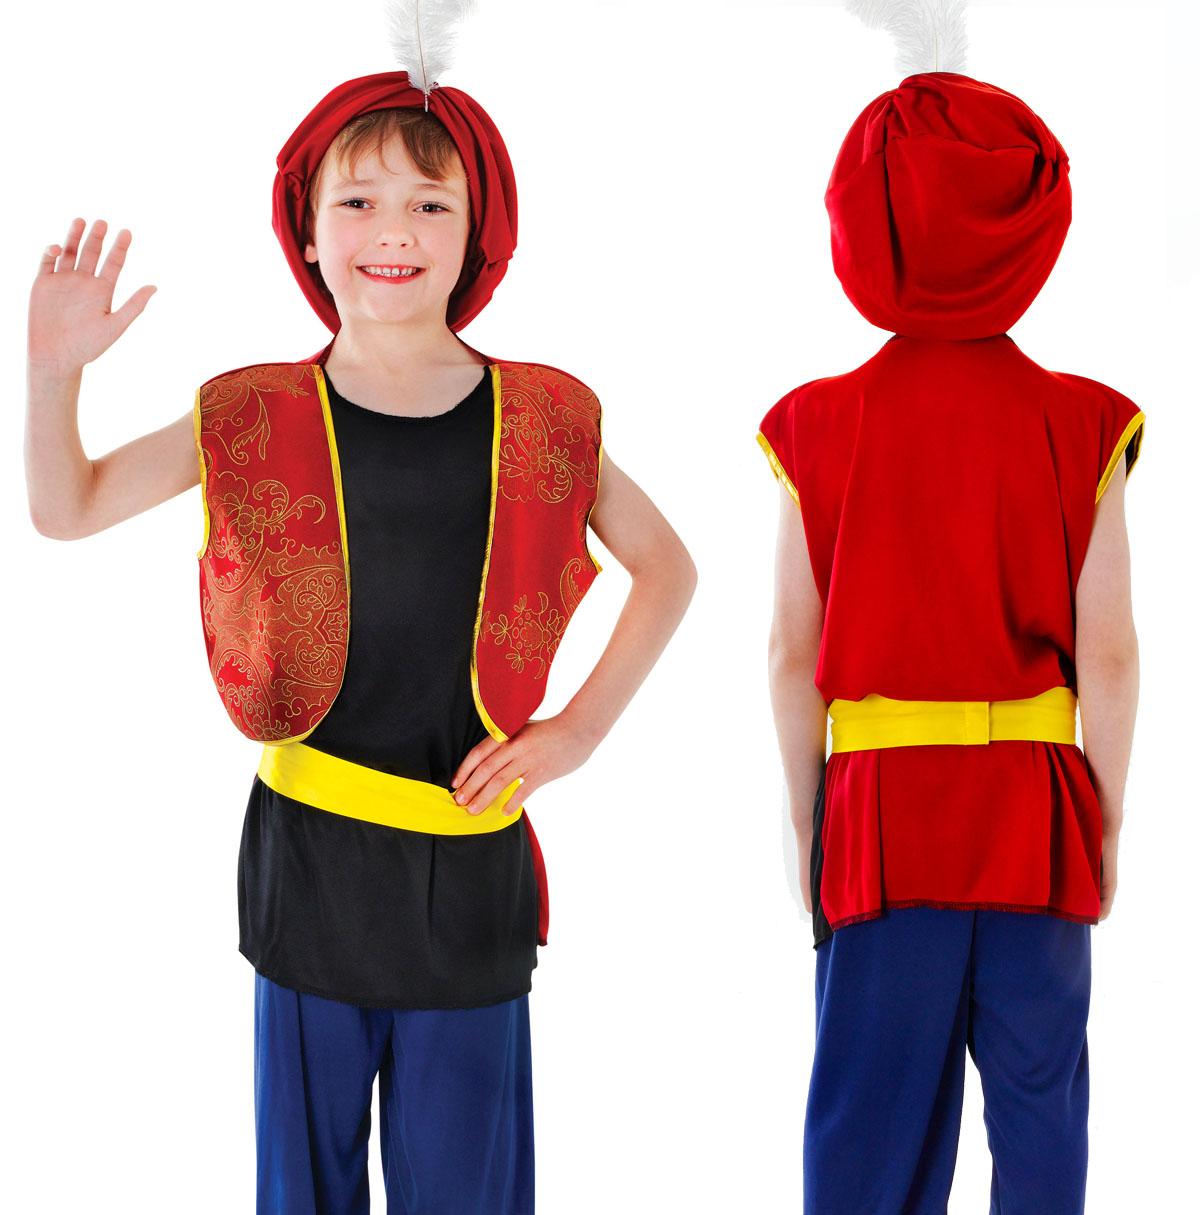 40794a7d8 Sentinel Childrens Kids Arabian Boy Fancy Dress Costume Aladdin Sultan  Outfit 3-13 Yrs Sc 1 St EBay